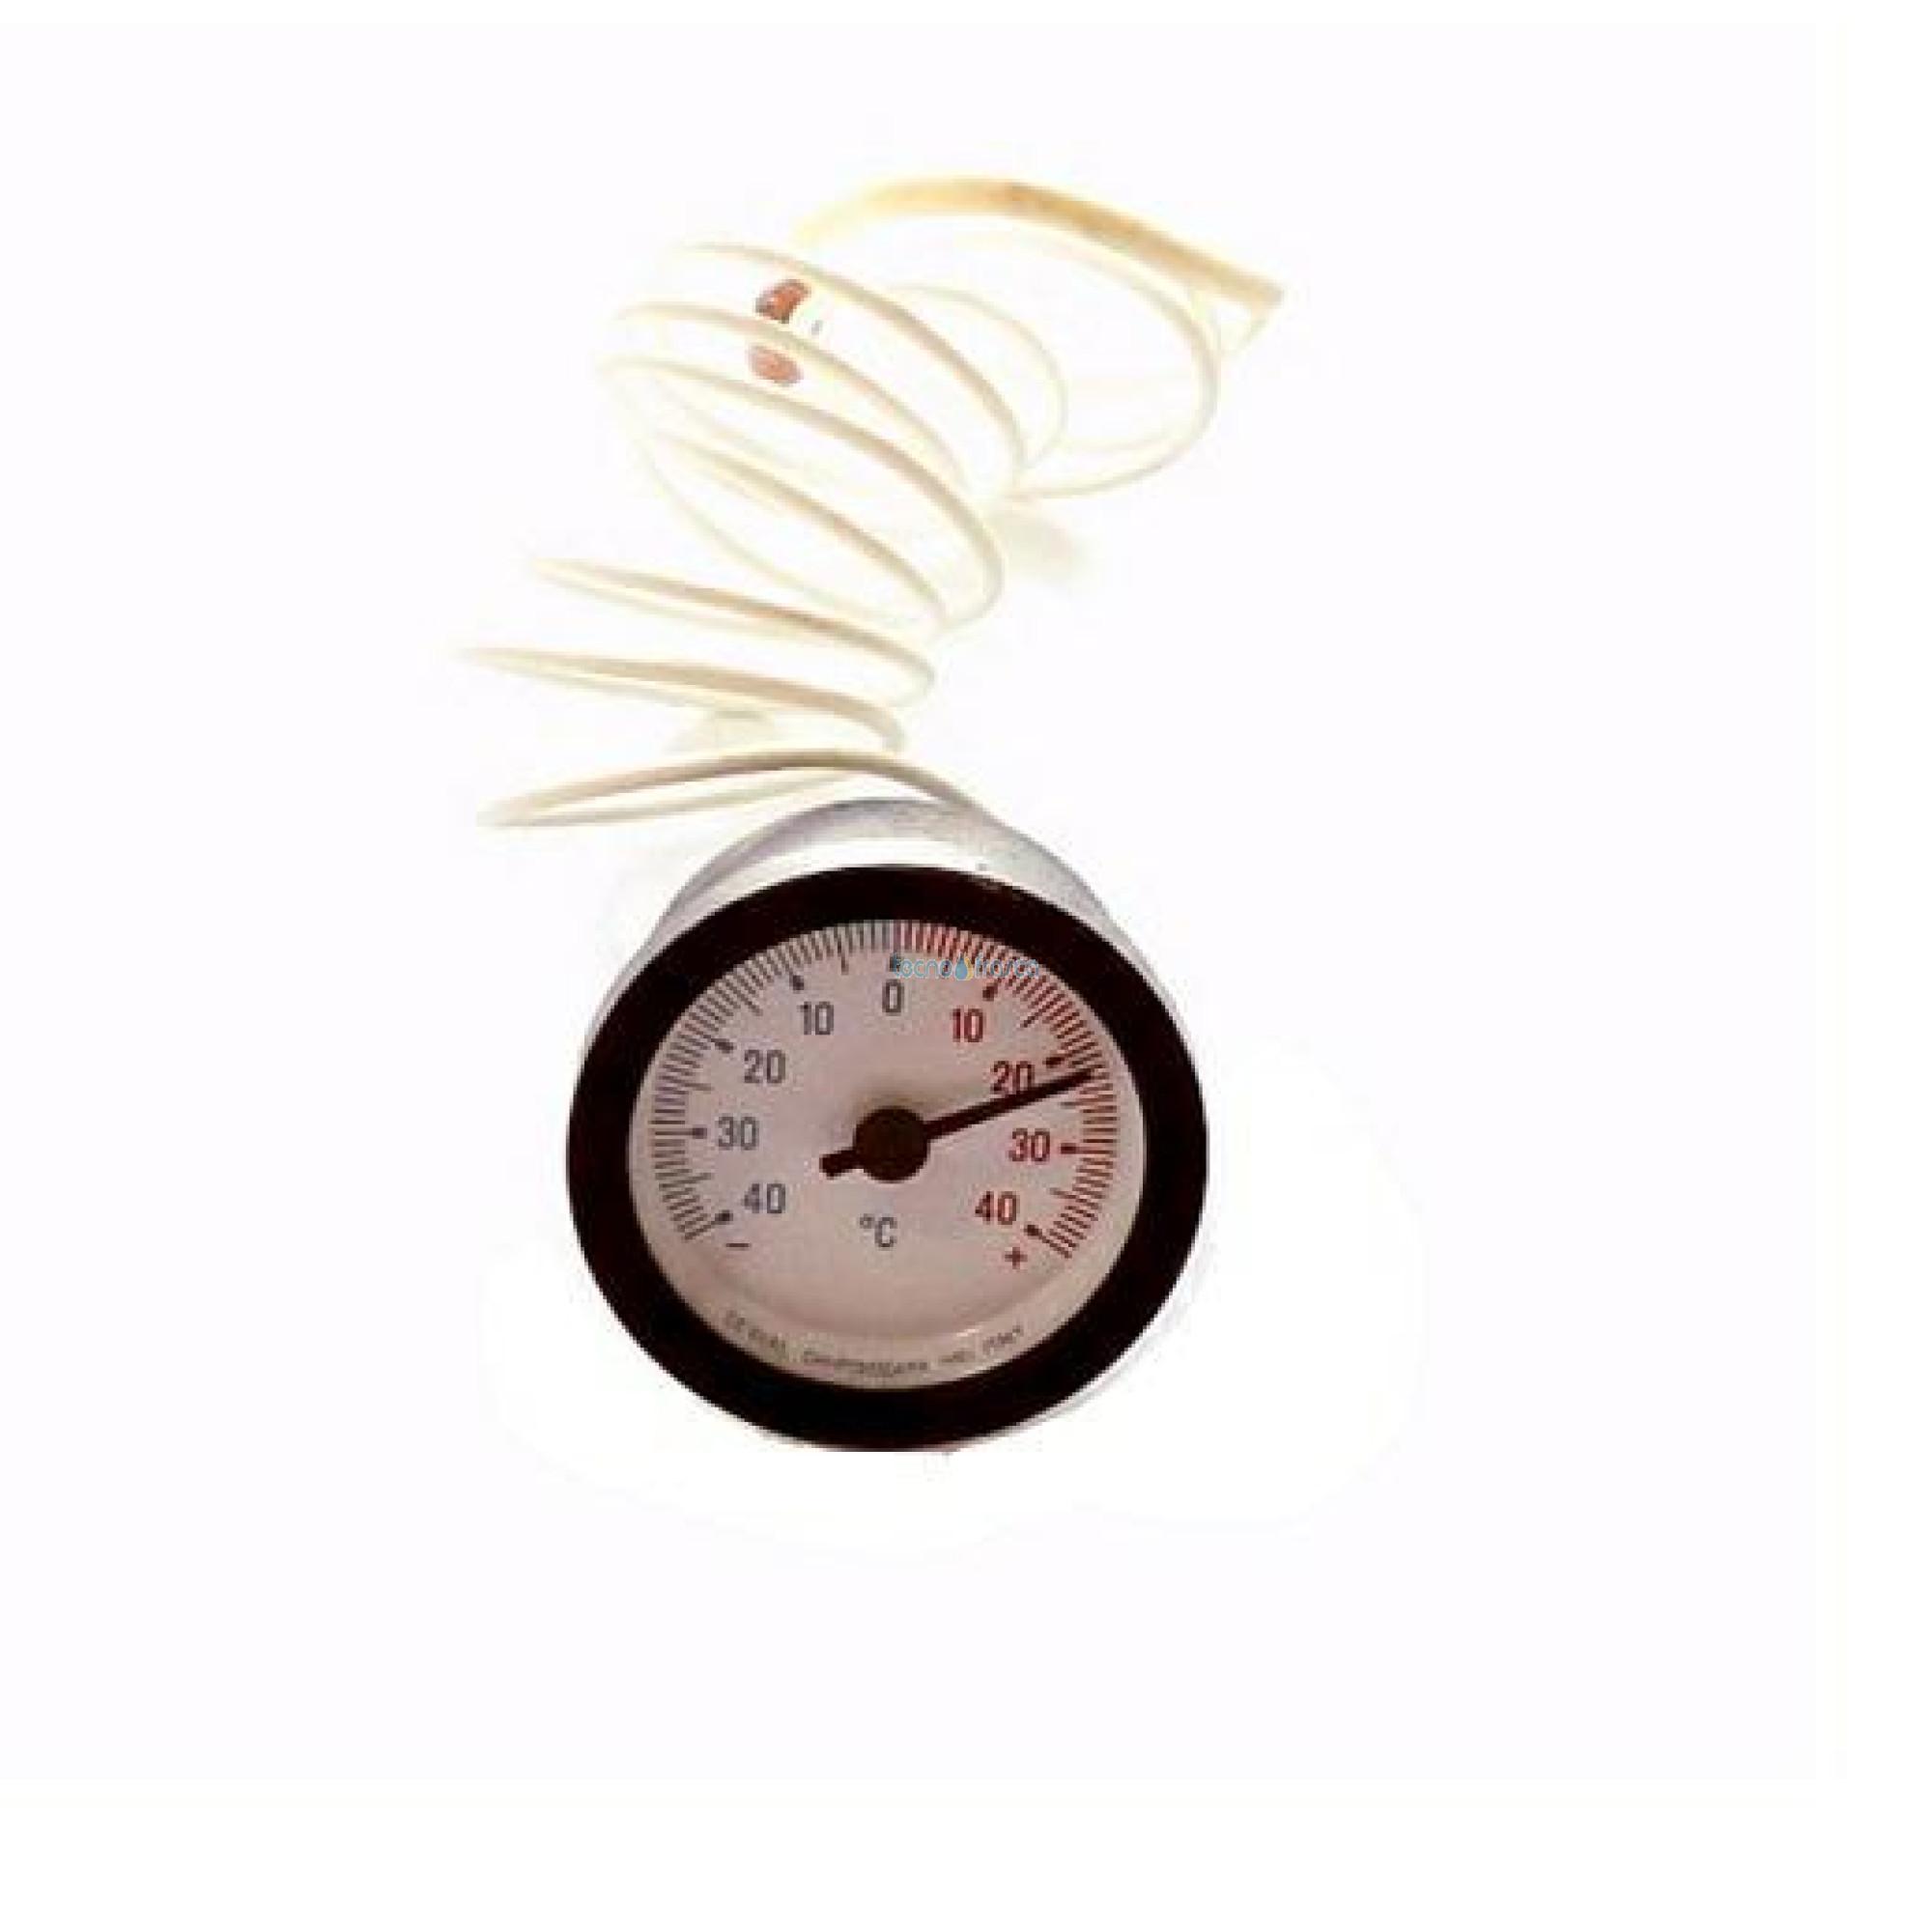 Termometro capillare d52 scala -40+40 cewal 91312219